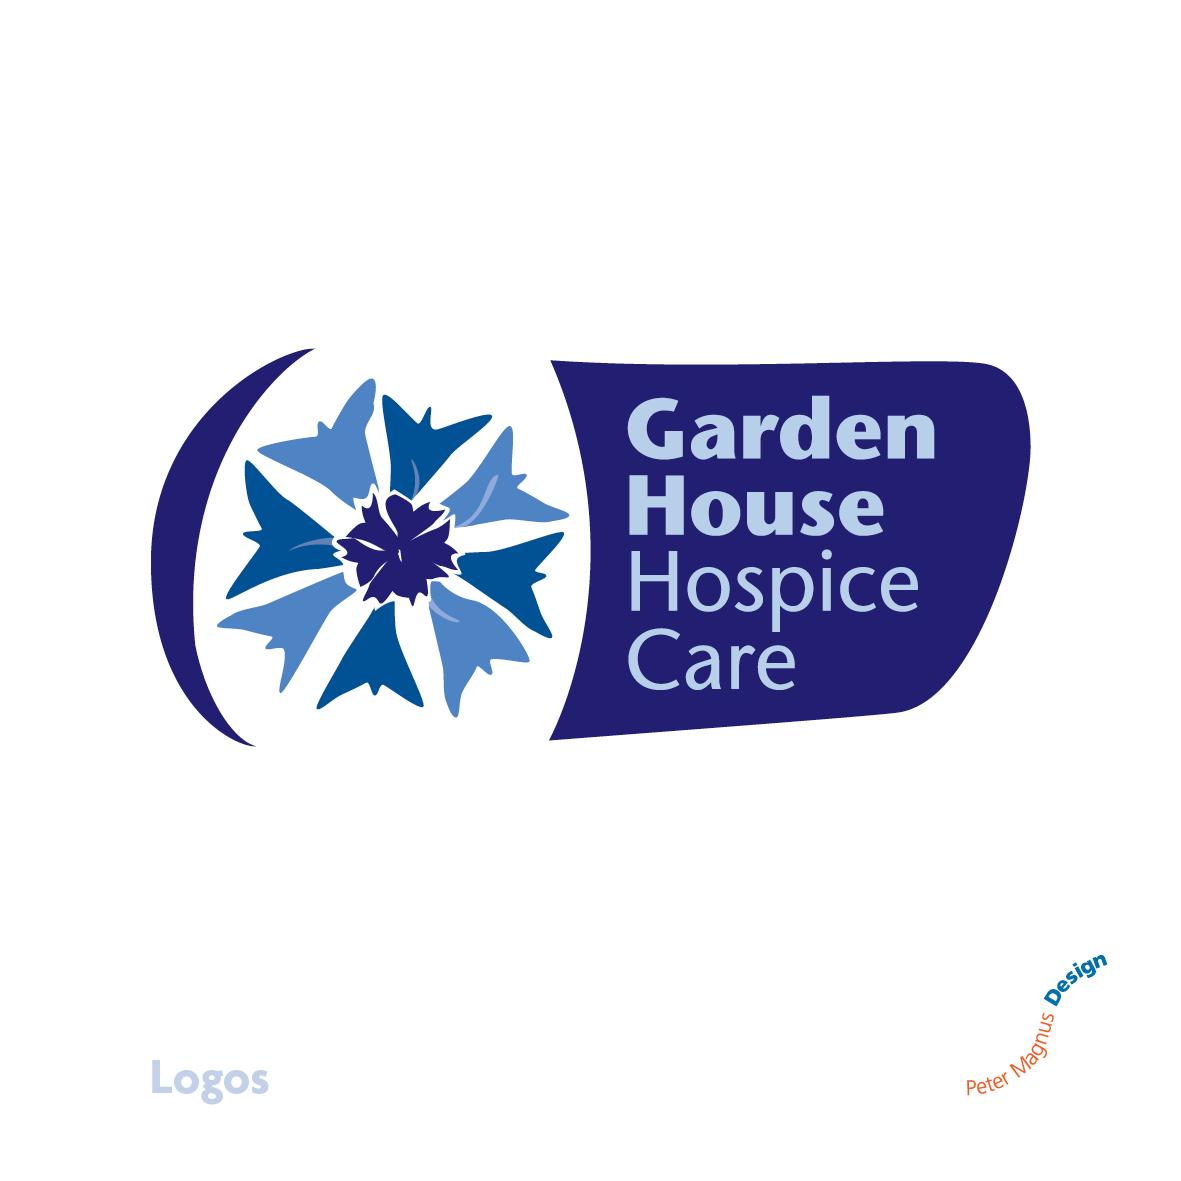 Garden House Hospice Care corporate identity, Welwyn Garden City, Herts